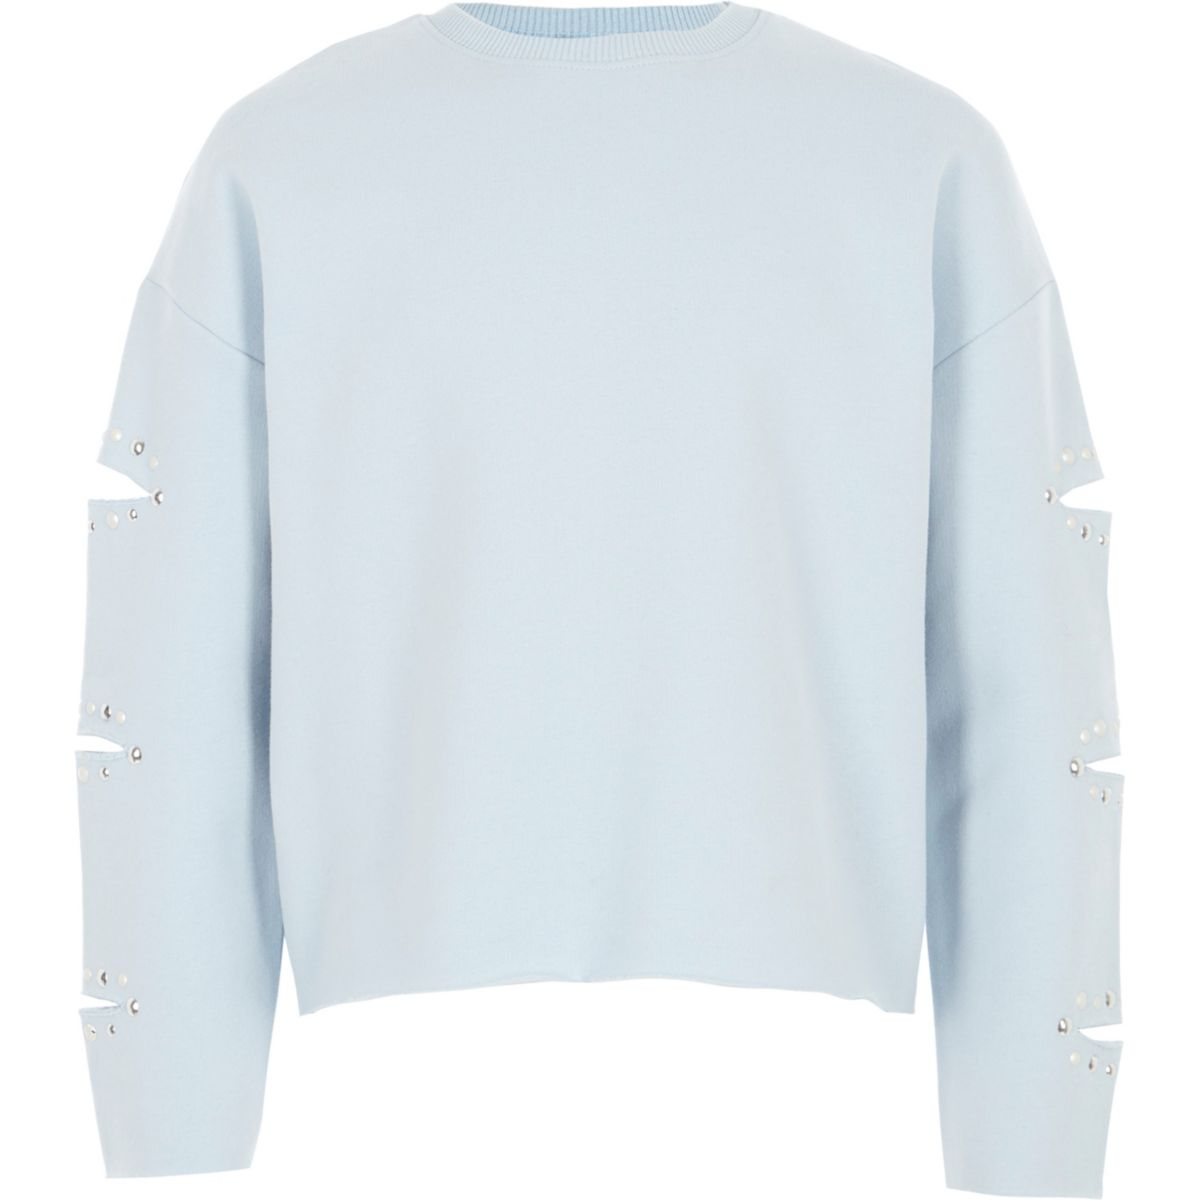 Girls light blue split sleeve sweatshirt